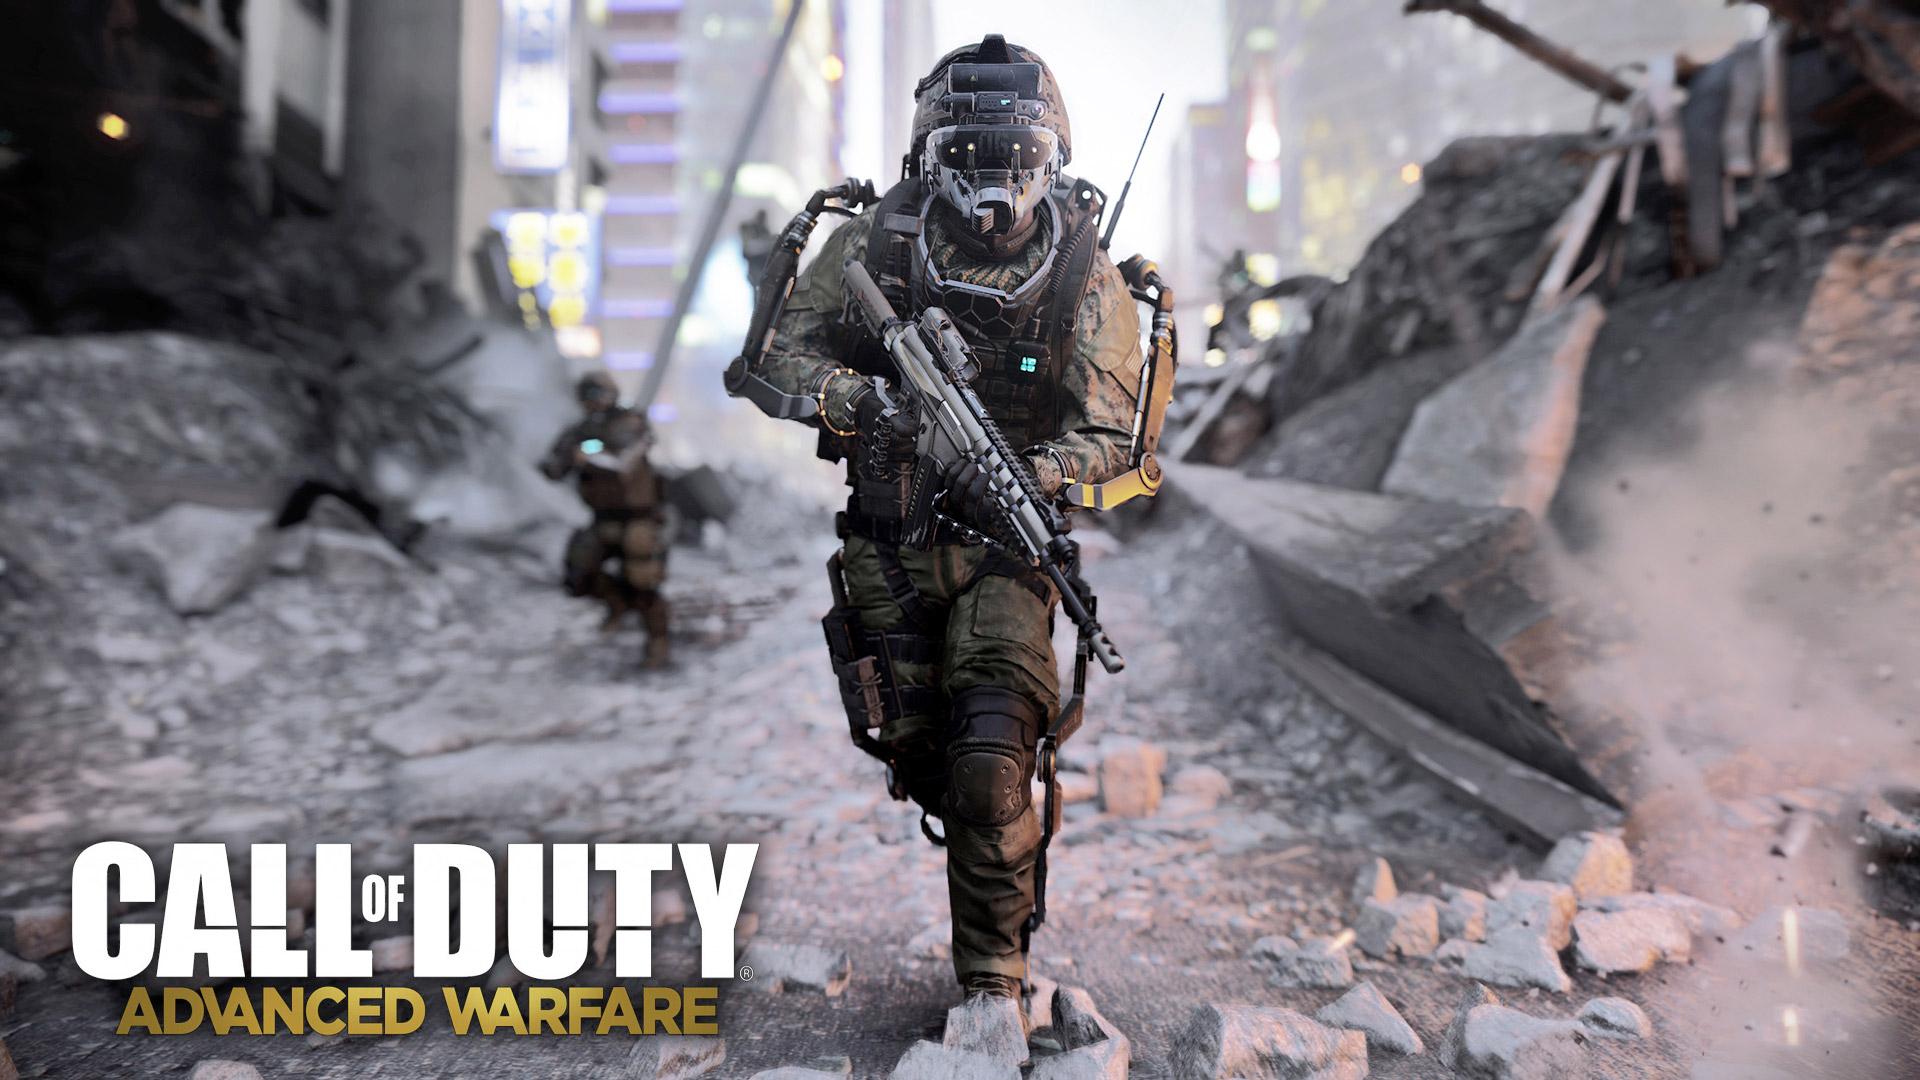 Call of Duty: Advanced Warfare Wallpaper in 1920x1080